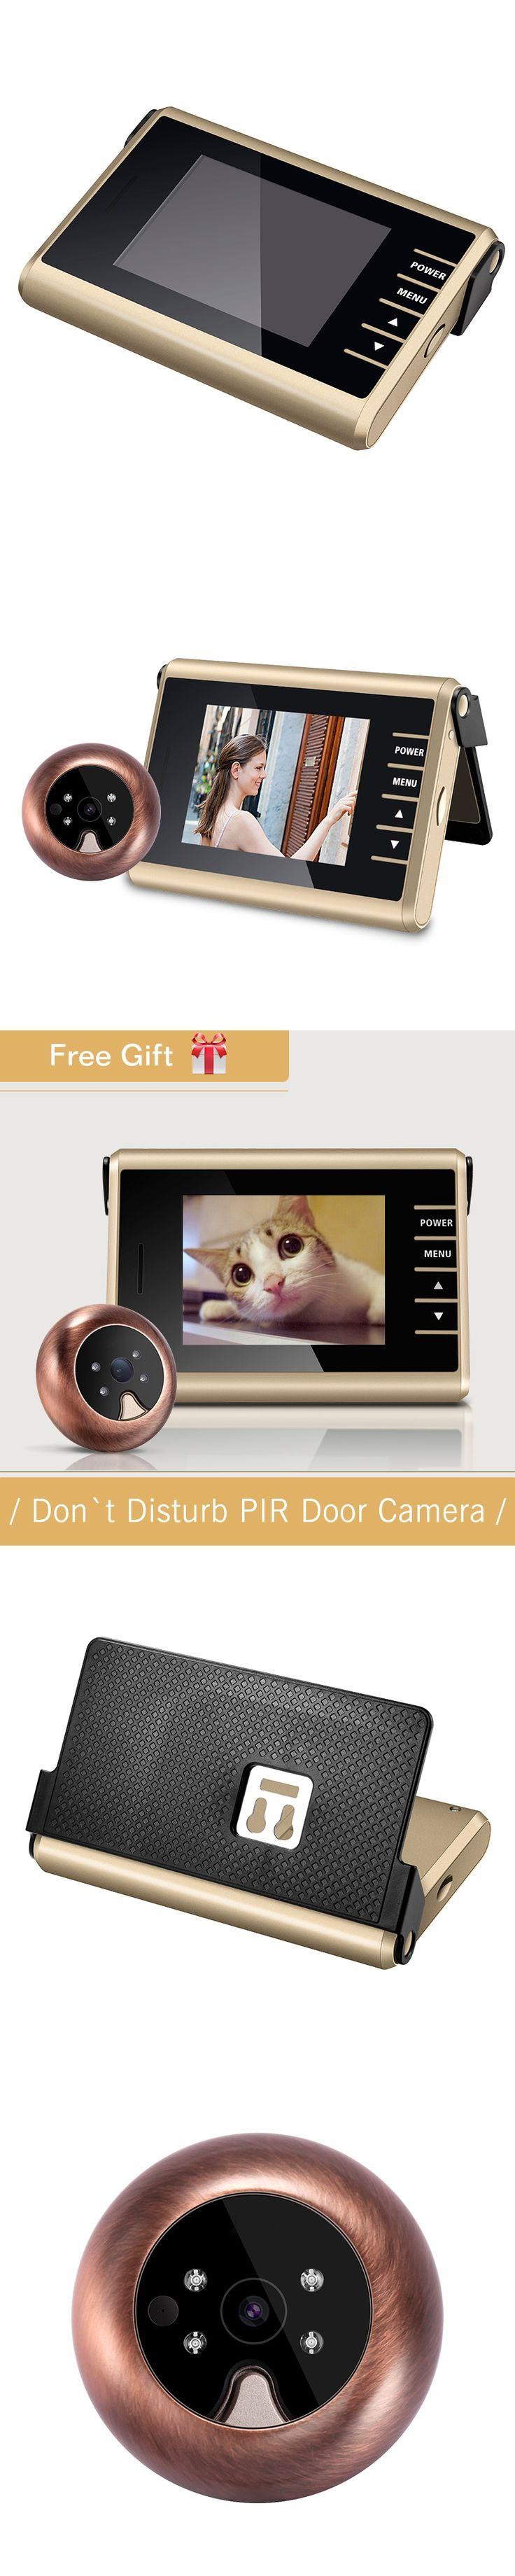 "New D12 Easy DIY 3.0"" LCD Digital Wireless Door Viewer Peephole Camera 1.0Mega pixels Photo/Video Recording Wireless Door Camera"